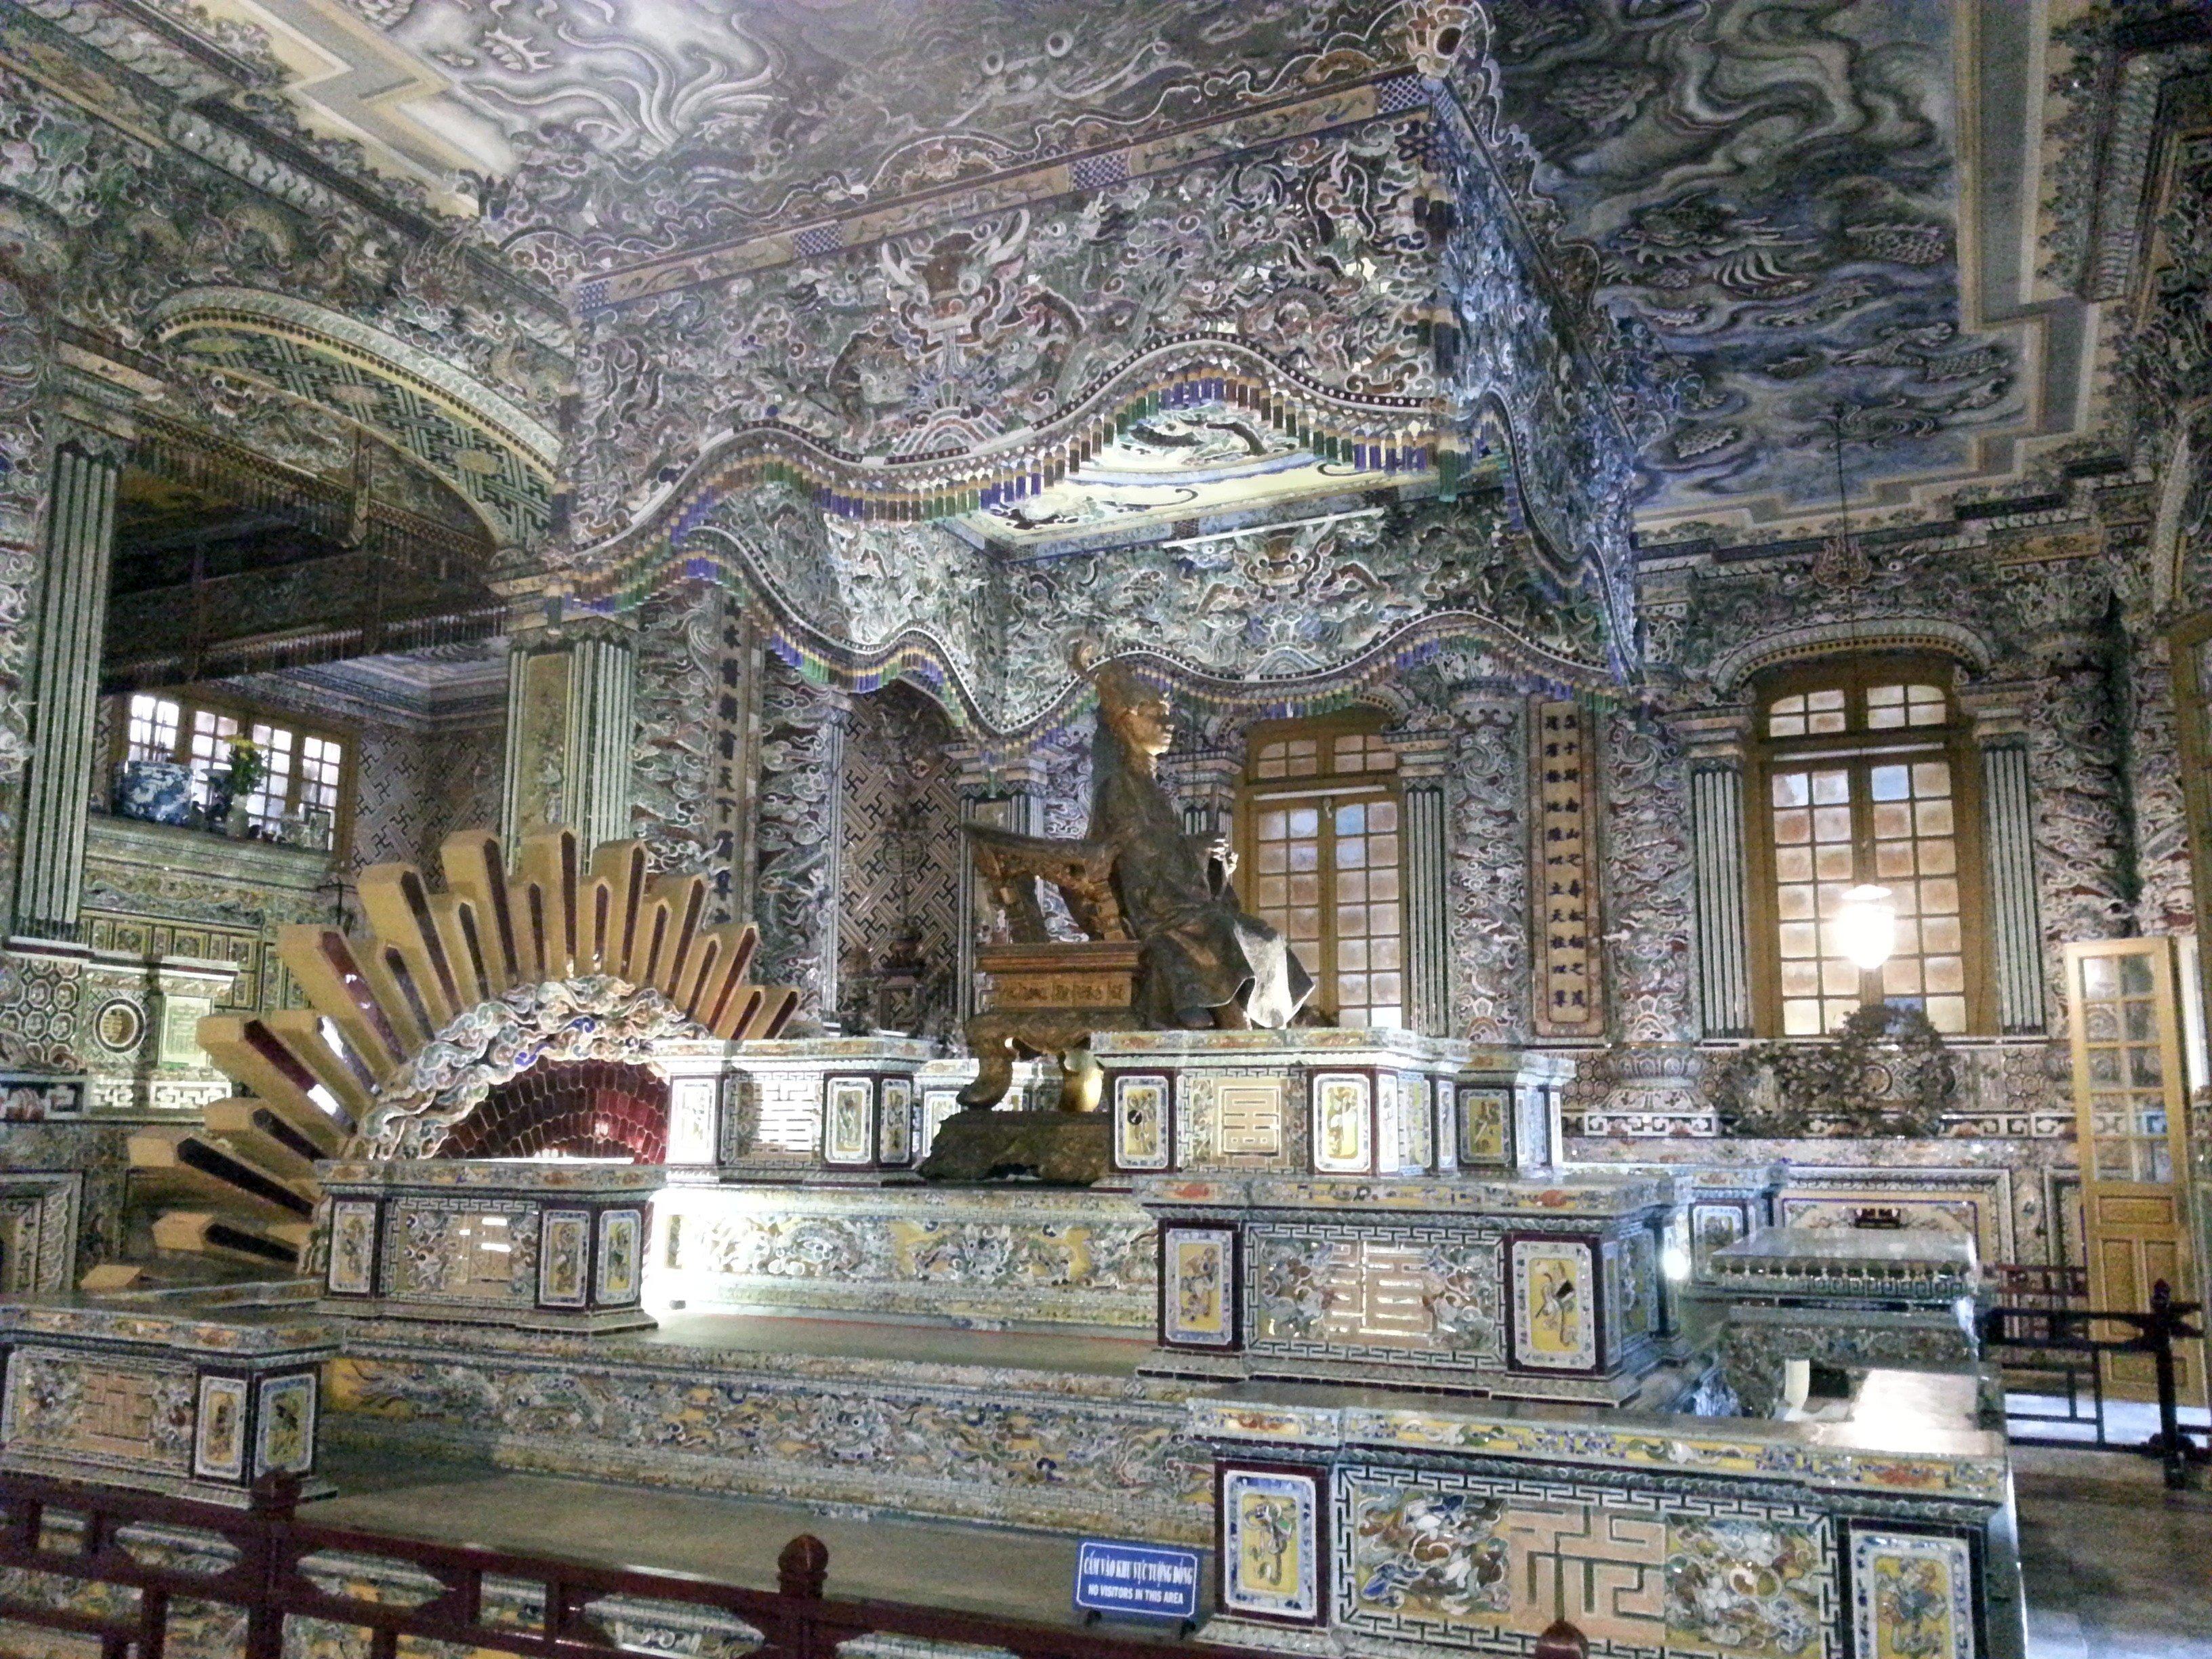 Emperor Khai Dinh's Crypt